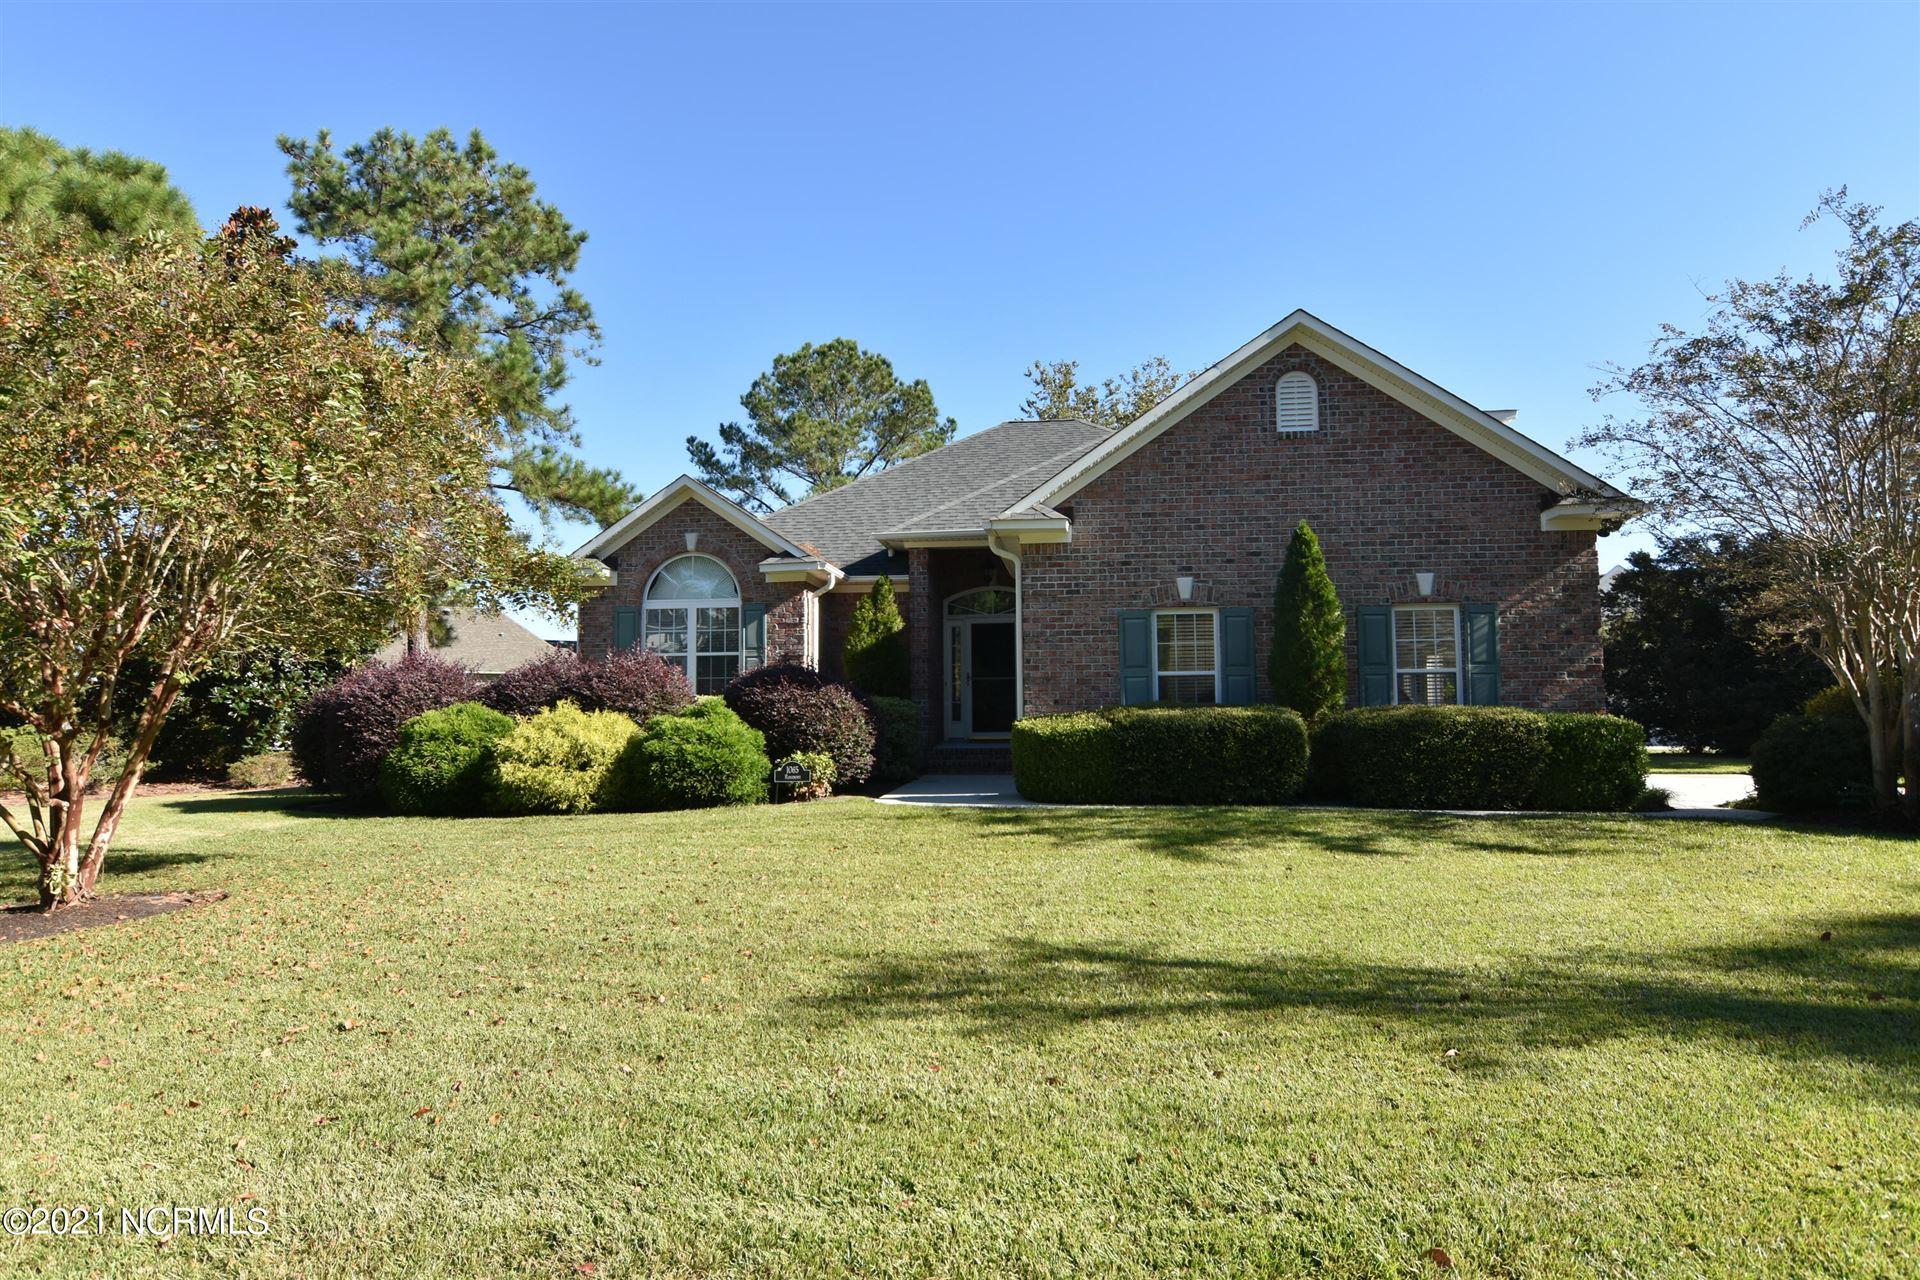 Photo of 1065 Ridgemont Drive, Leland, NC 28451 (MLS # 100295727)